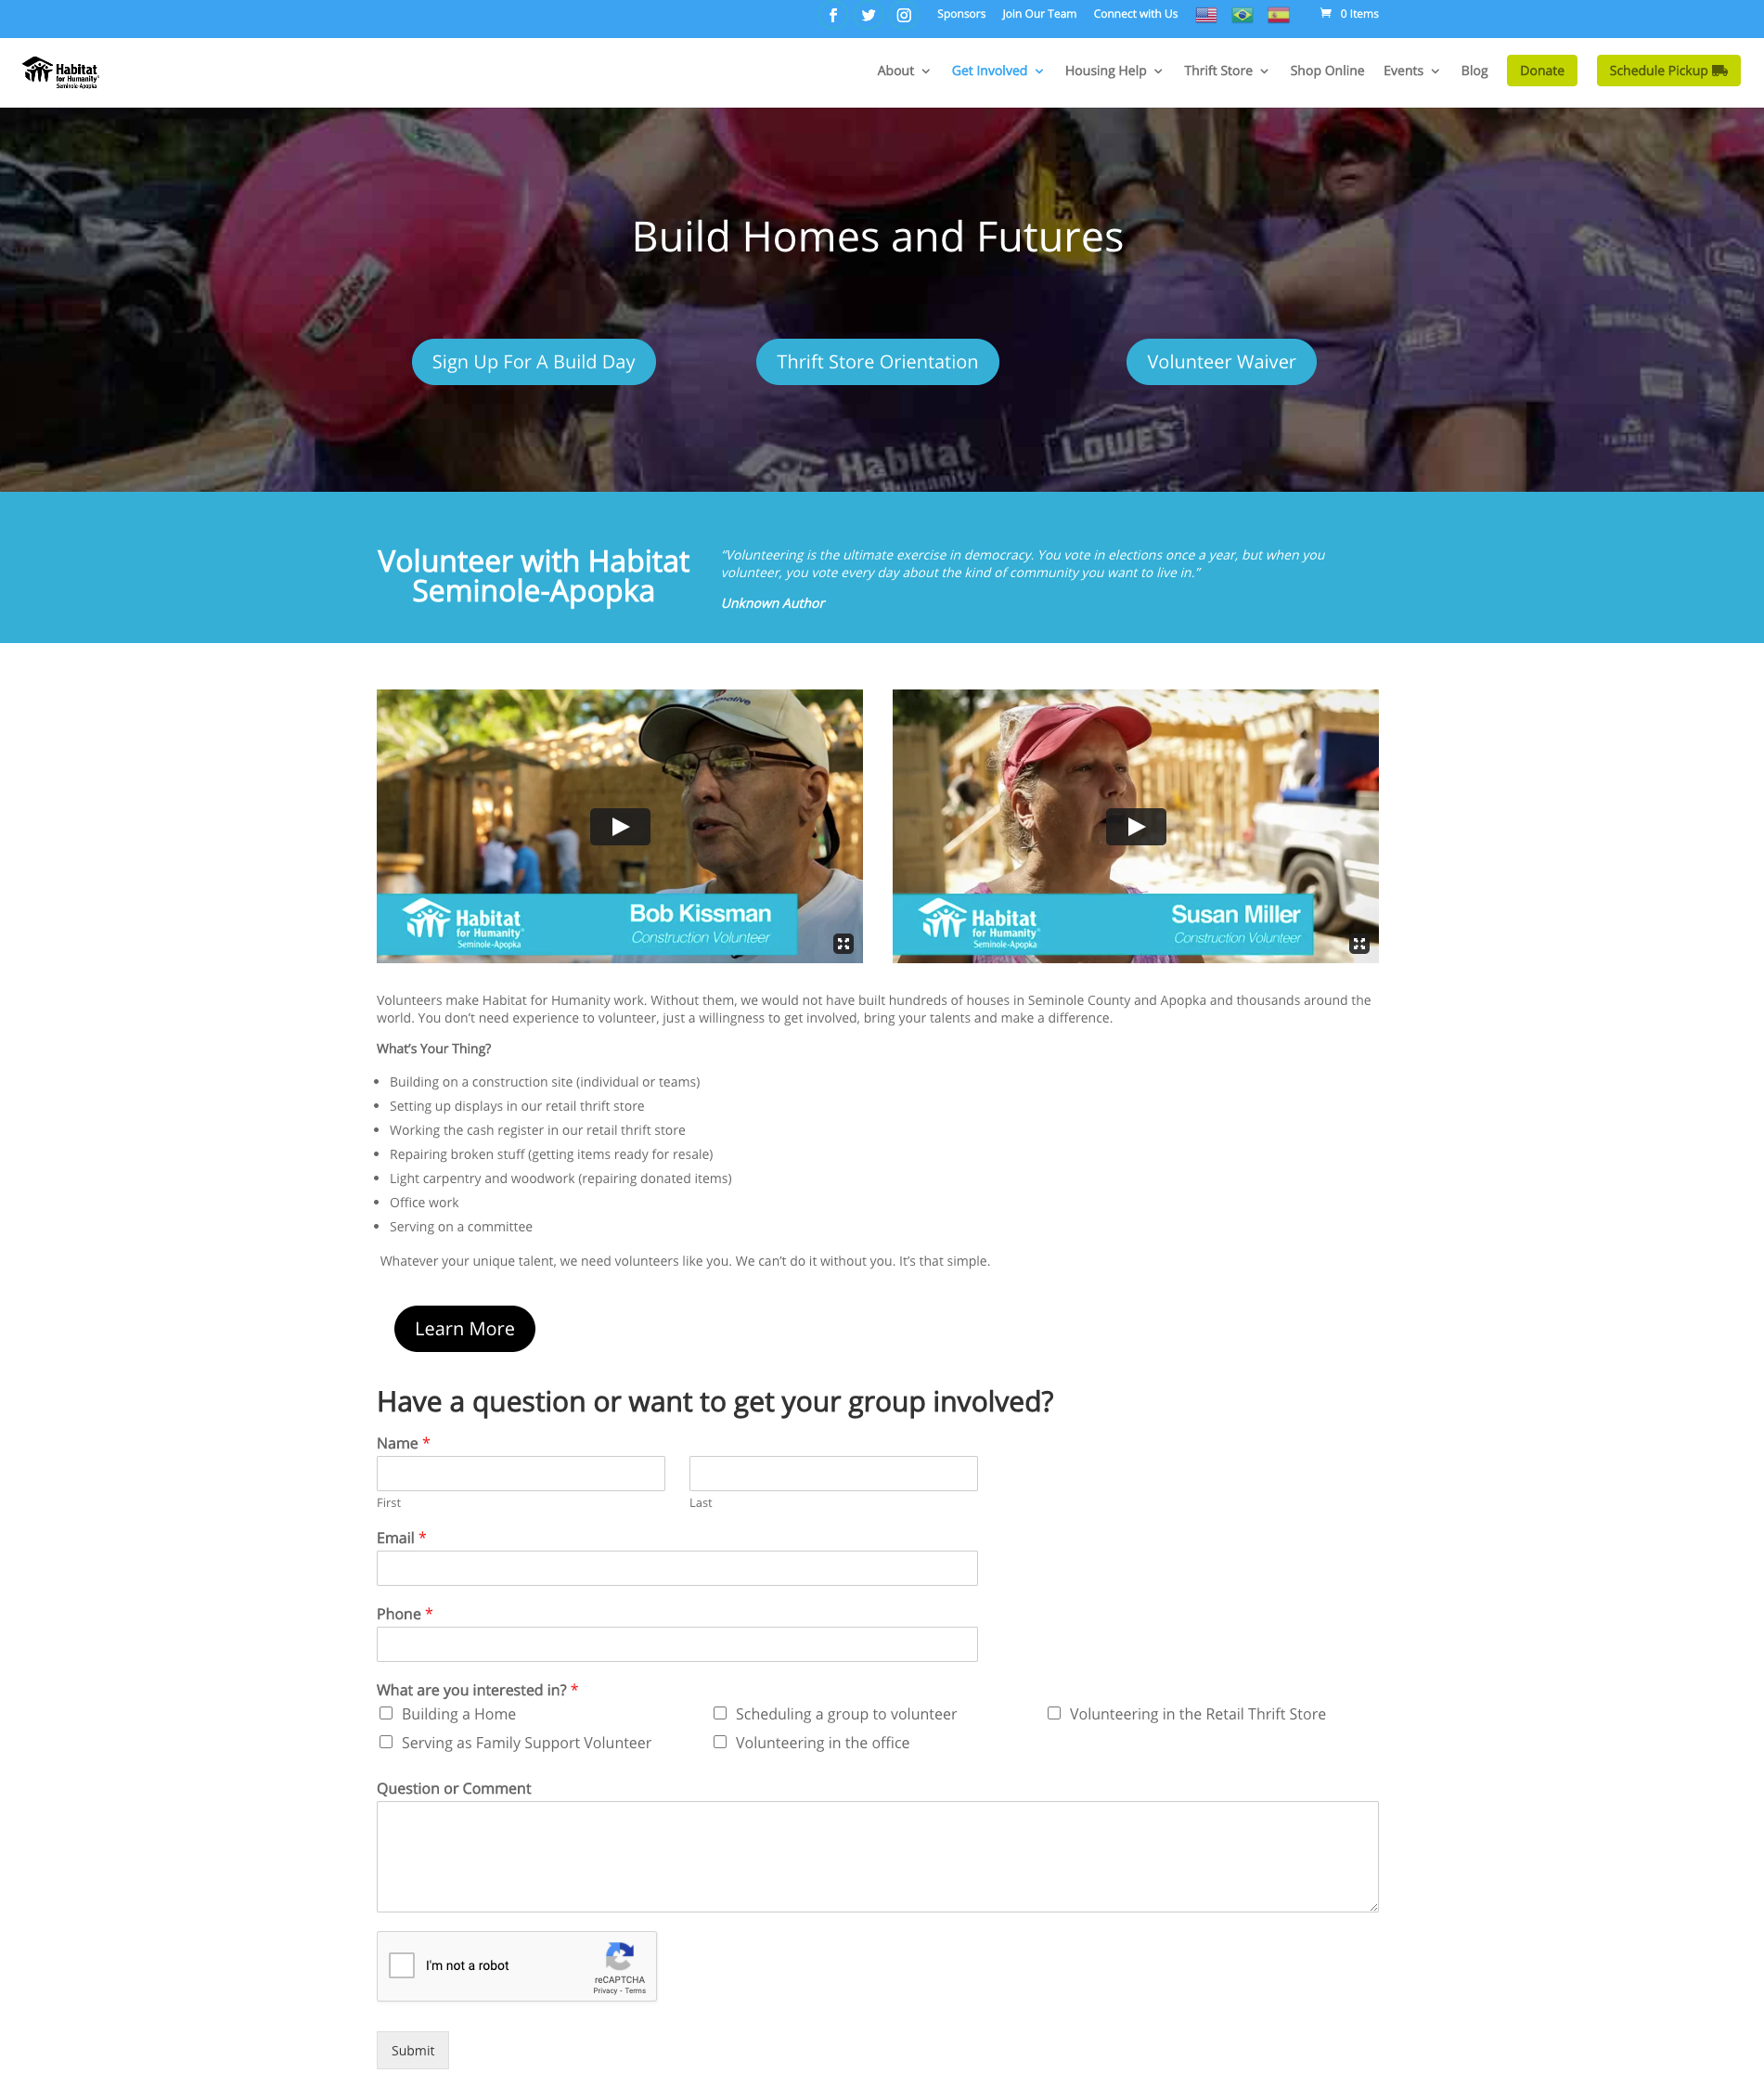 Guide to Nonprofit Websites - Volunteer - Habitat